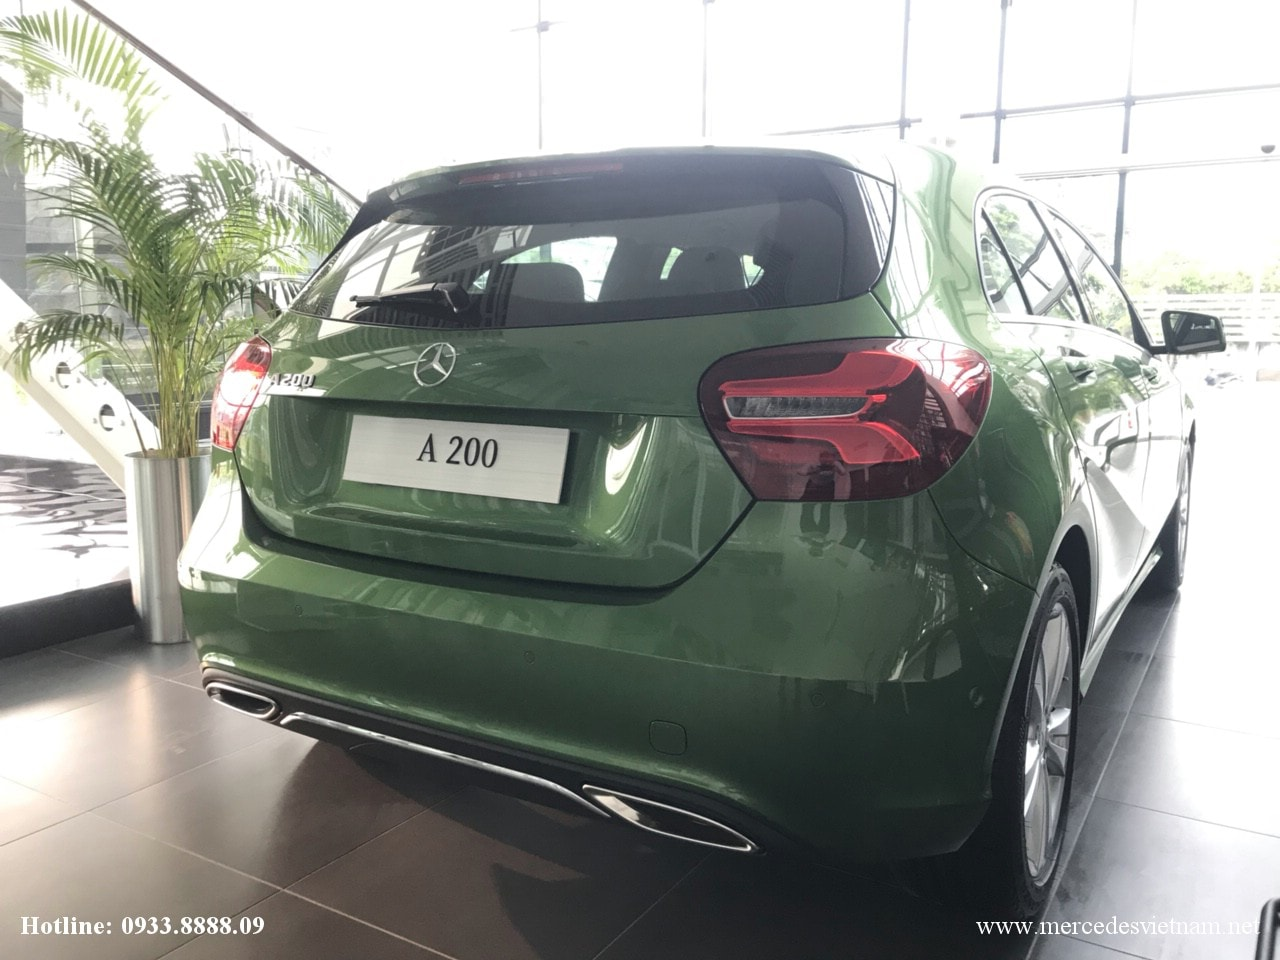 Mercedes A200 2018 2019 moi (2)-min